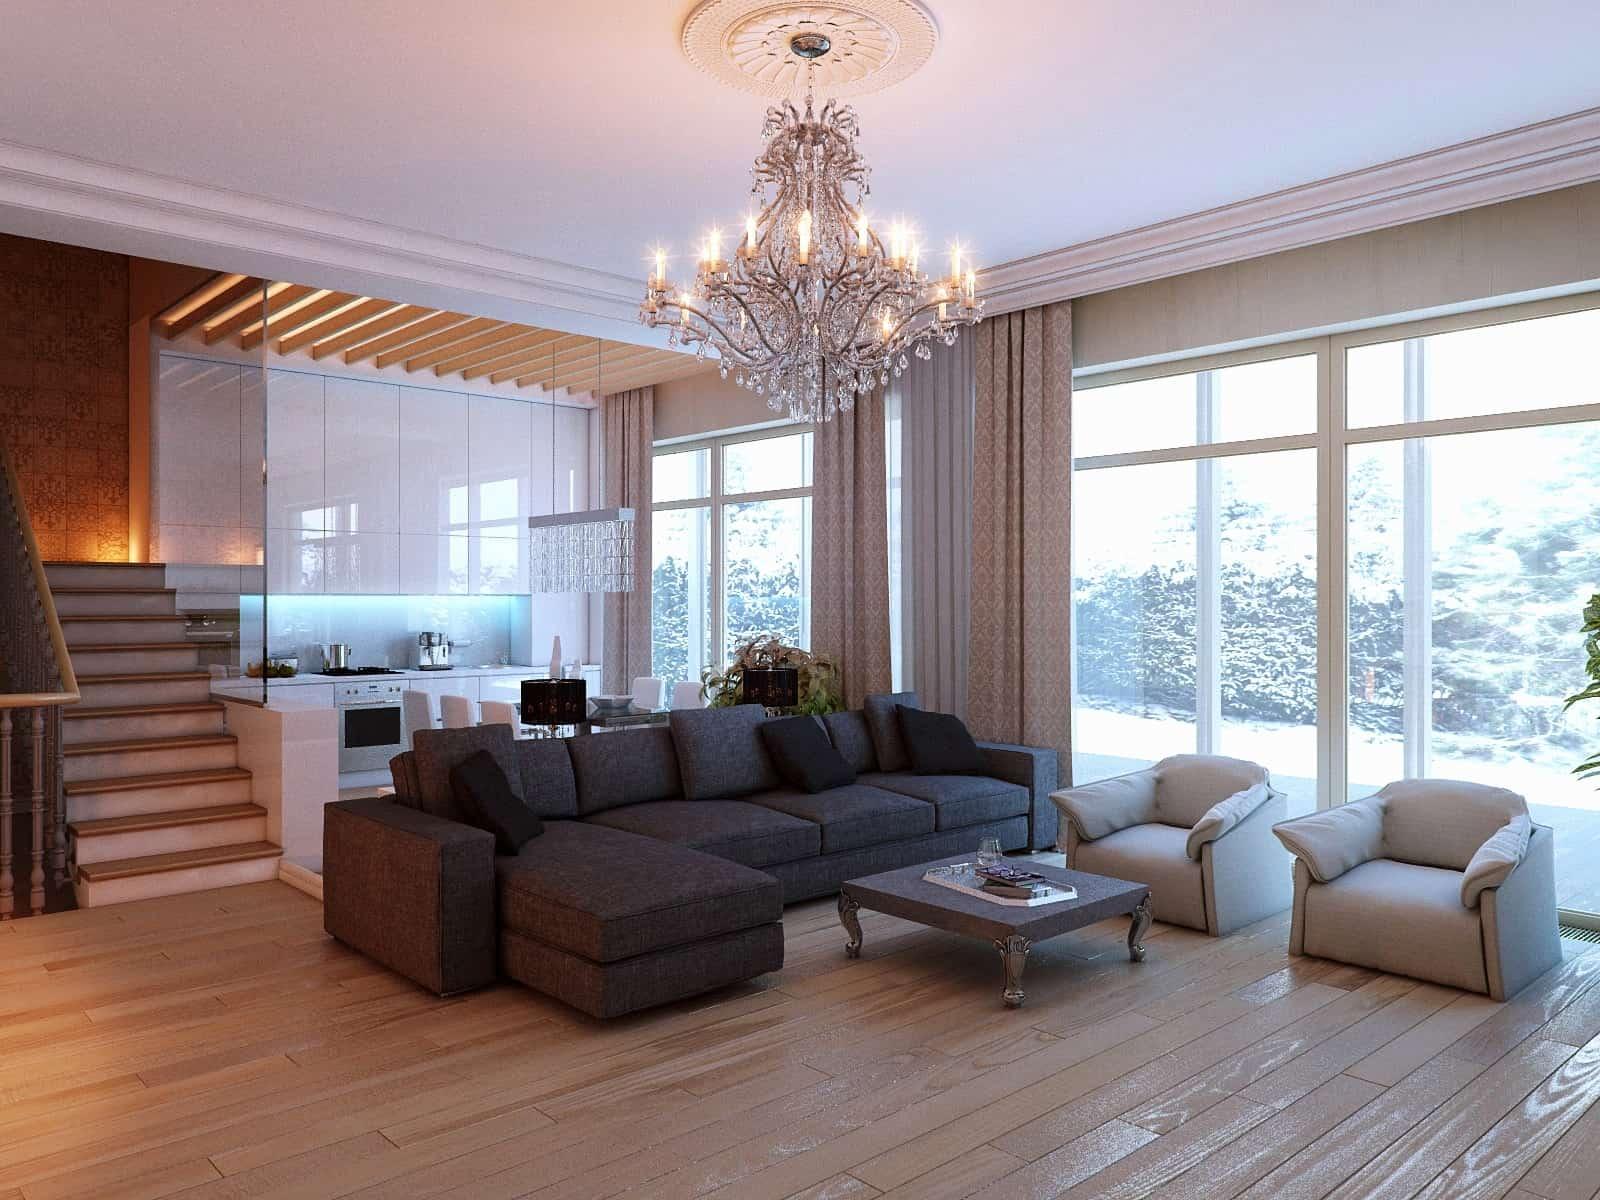 wooden floor living room designs Awesome Light Hardwood Floors Living Room